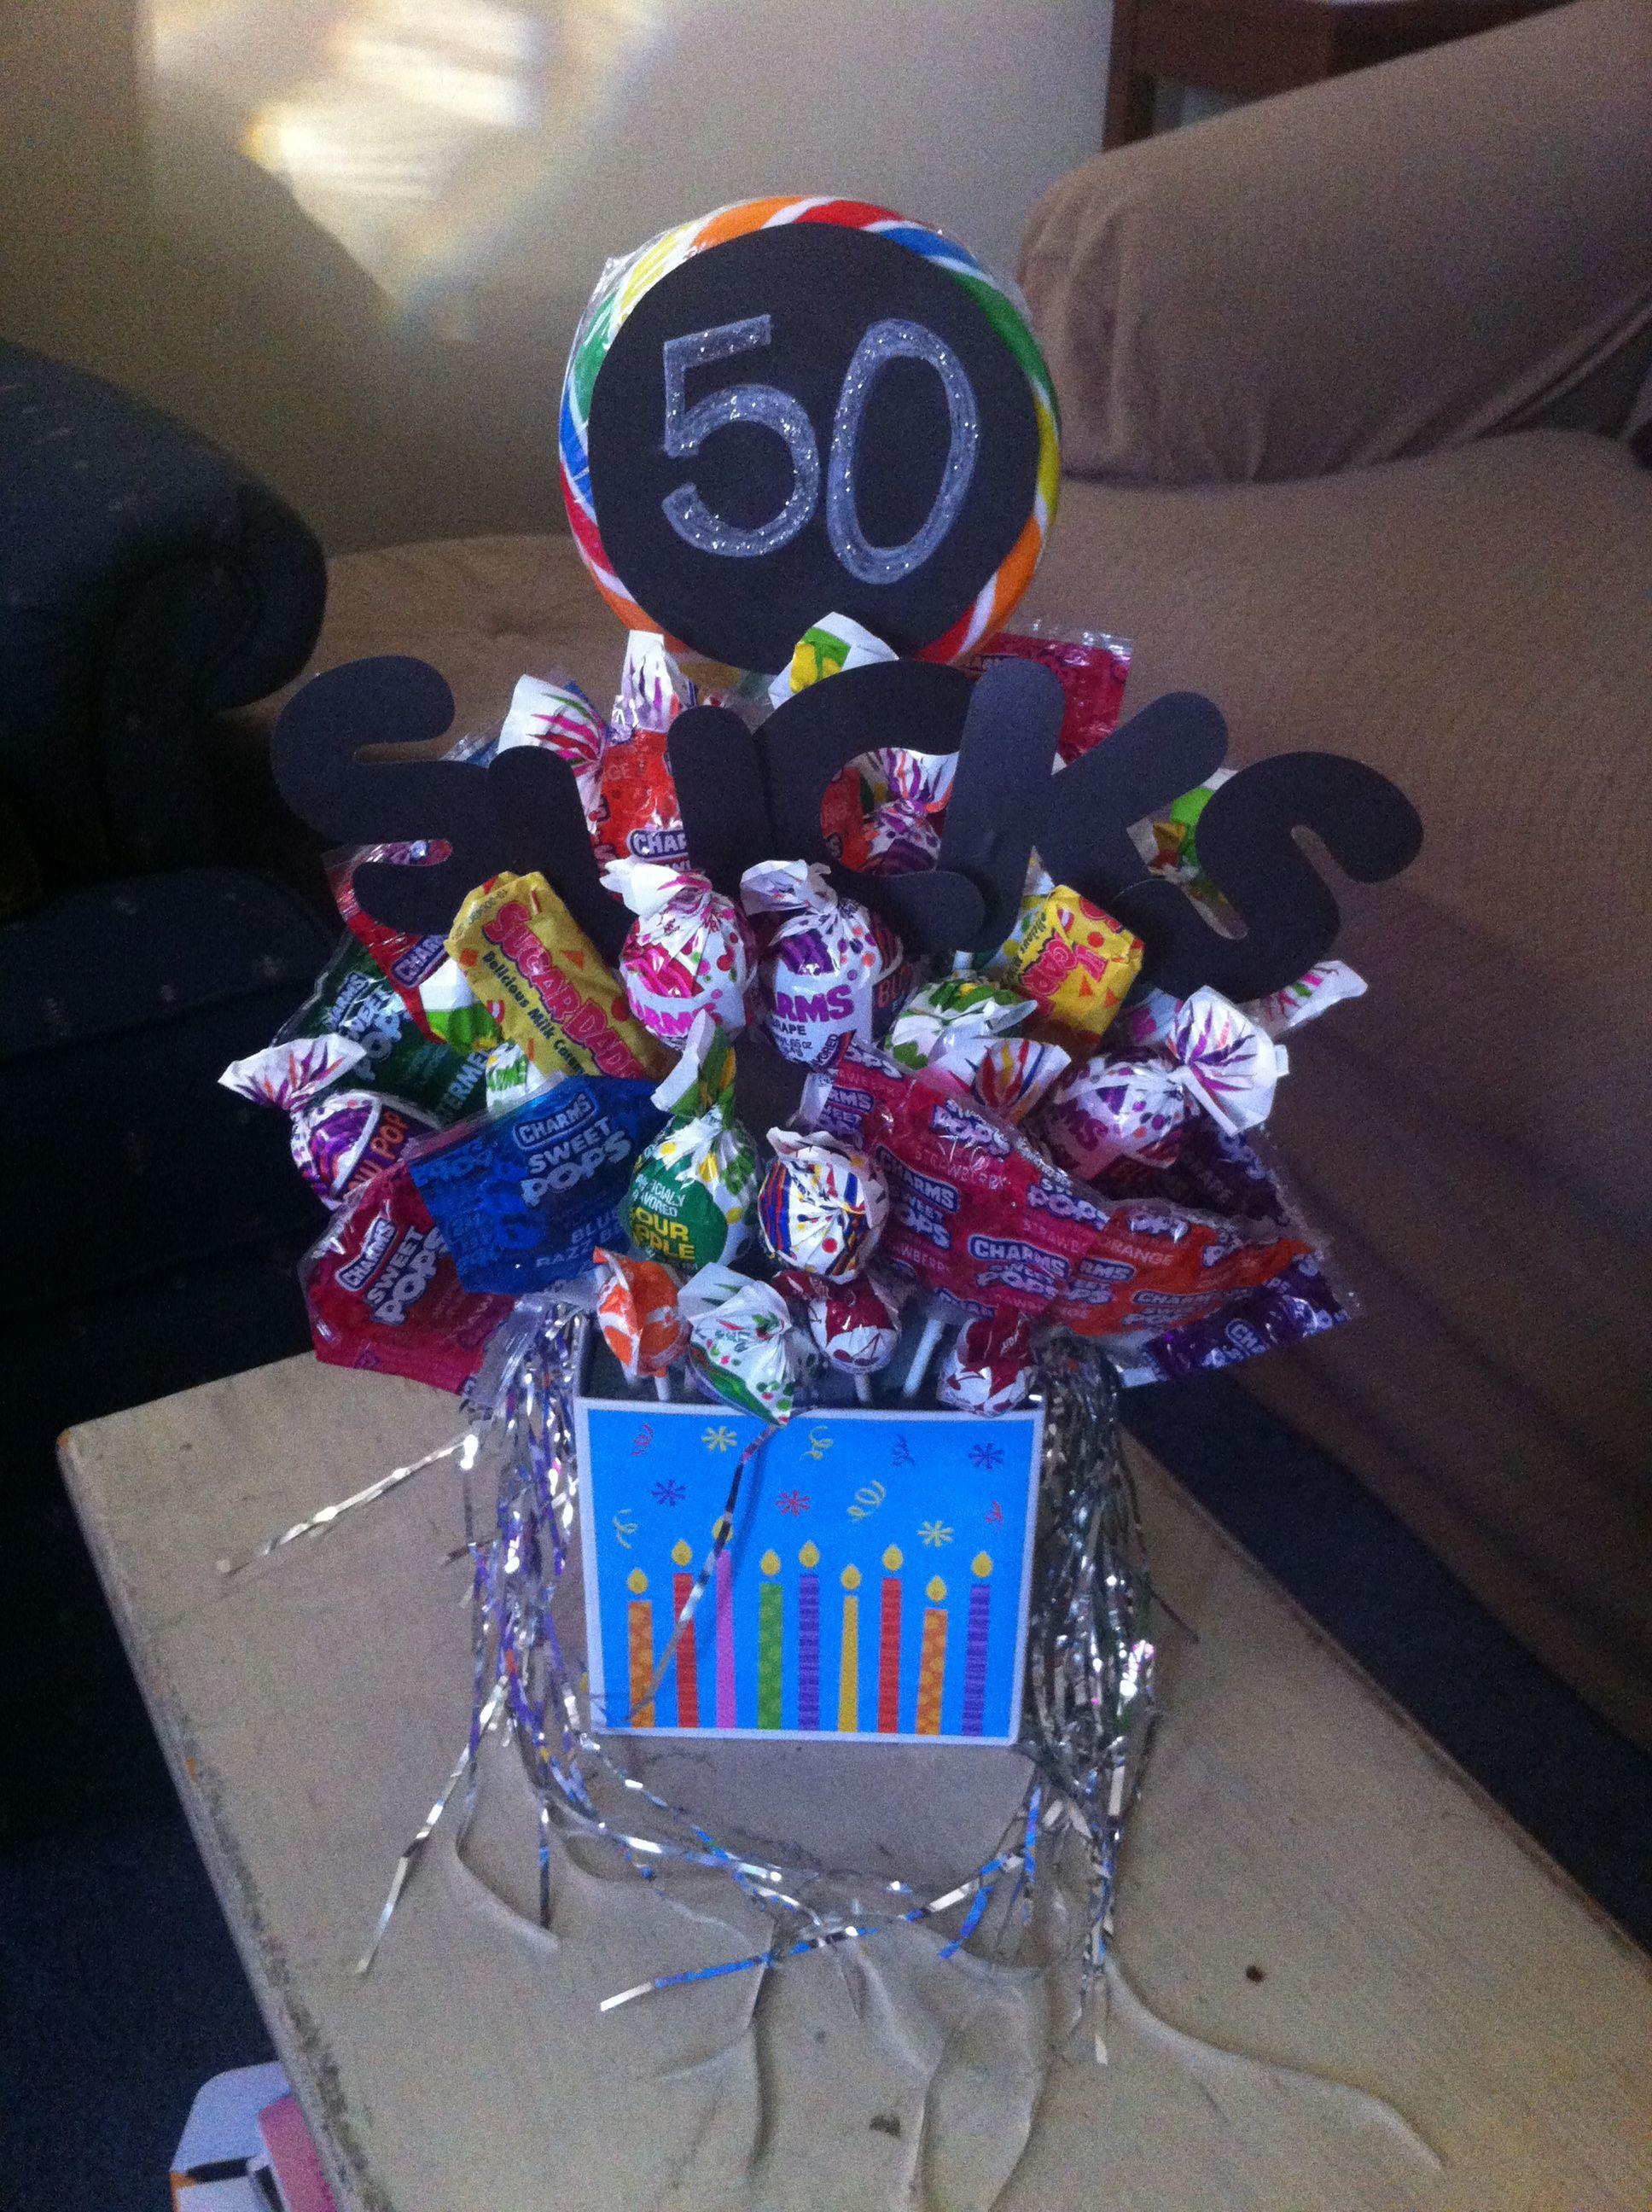 50th birthday present! 50th birthday, 50th birthday